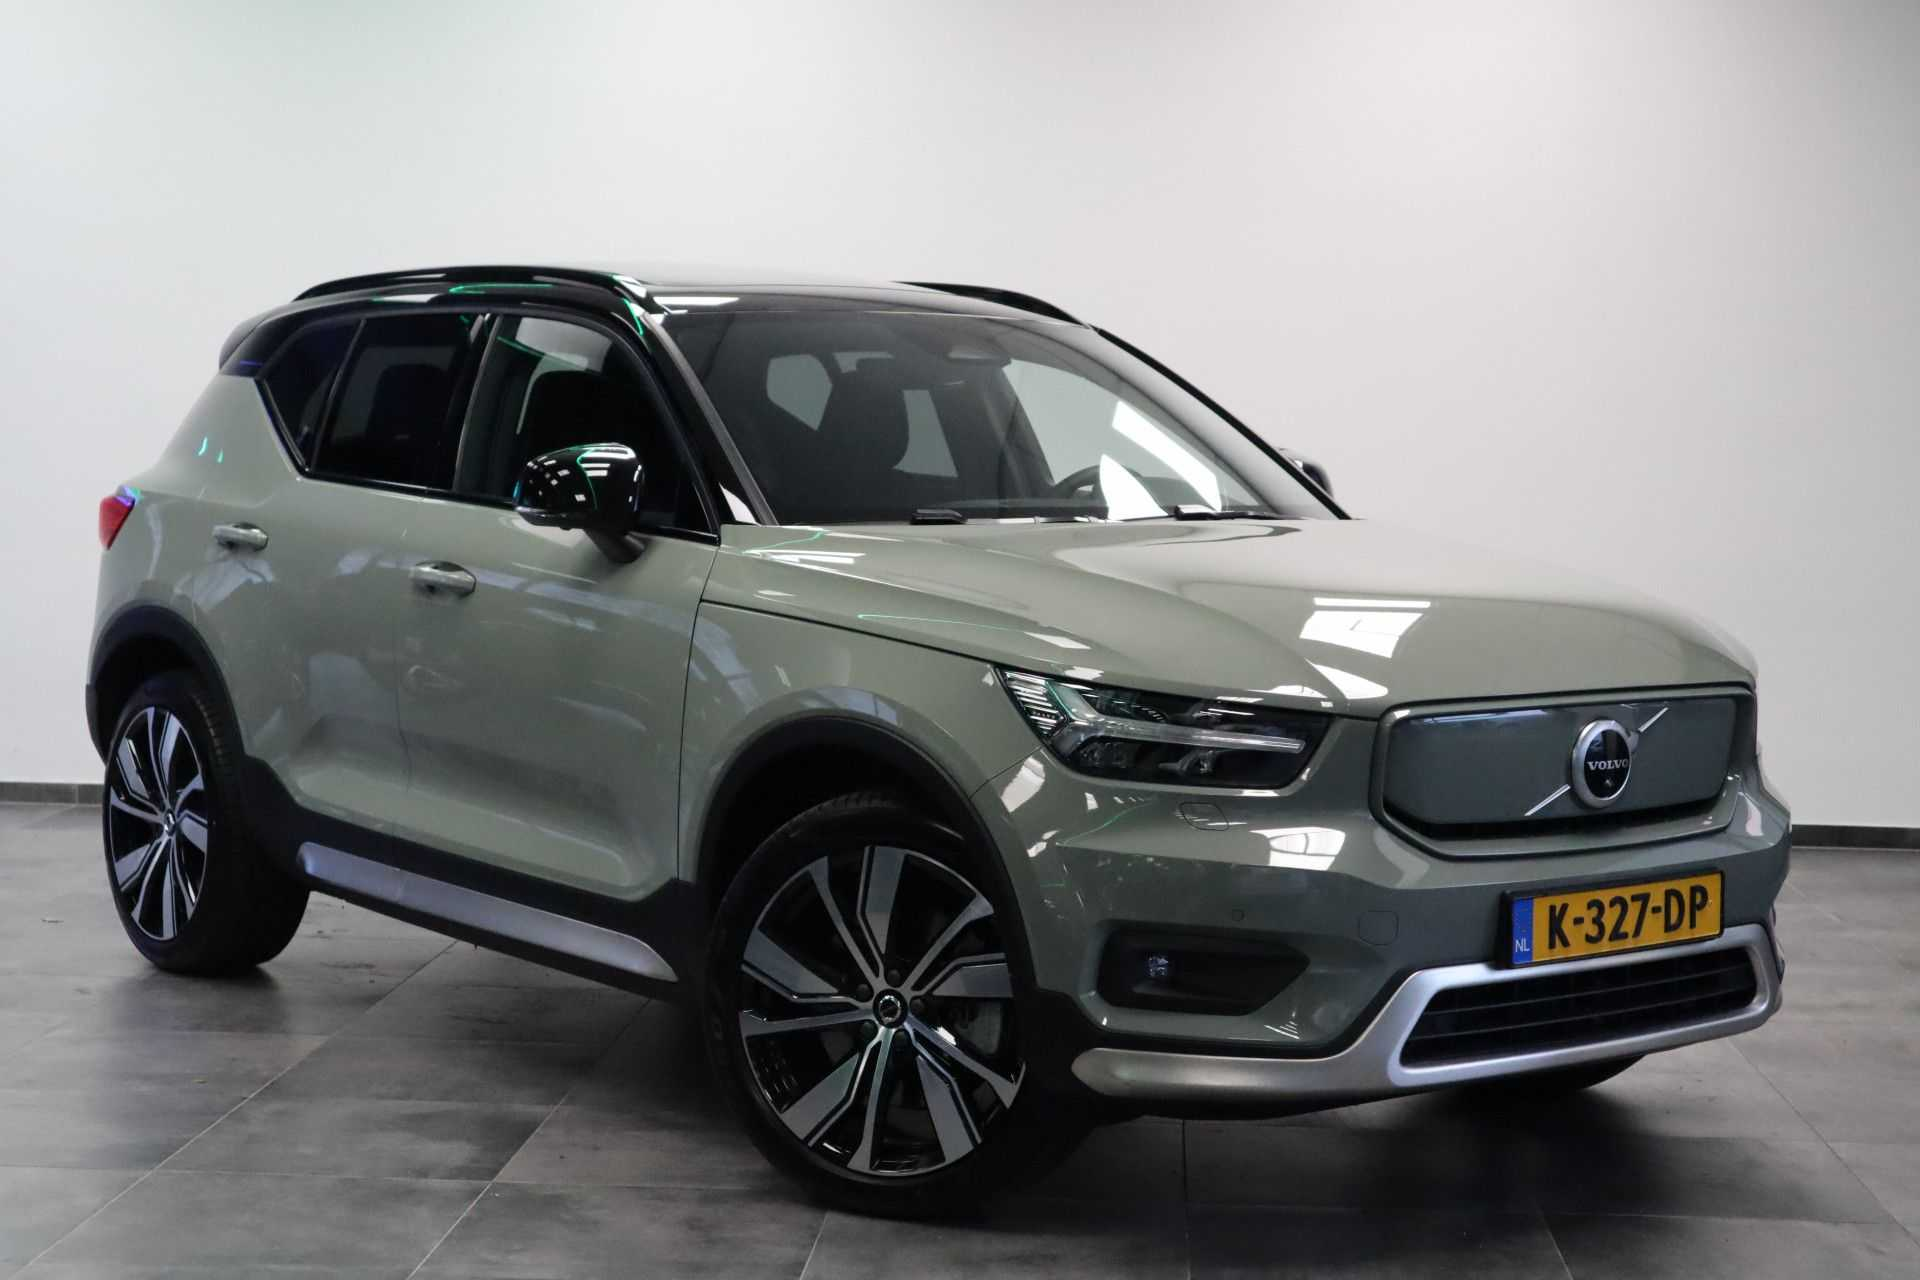 "Volvo XC40 Recharge P8 AWD R-Design EX BTW! Panoramadak 360 Camera 20""LM 8% Bijtelling Bodykit Direct leverbaar"